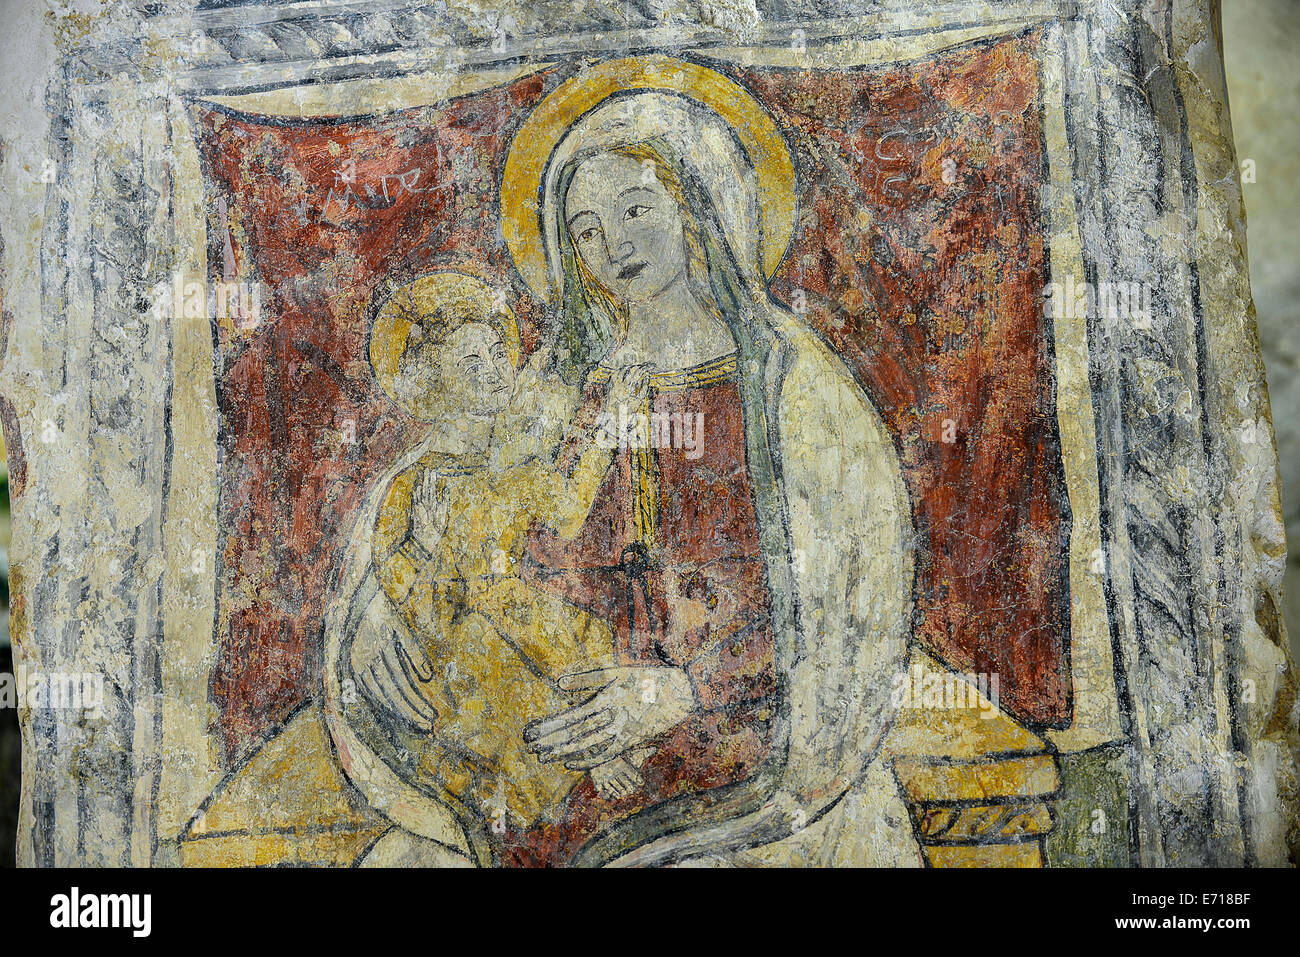 Italy Basilicata Matera Rupestrian Church of Santa Lucia alle Malve Fresco of the Madonna and Child Stock Photo